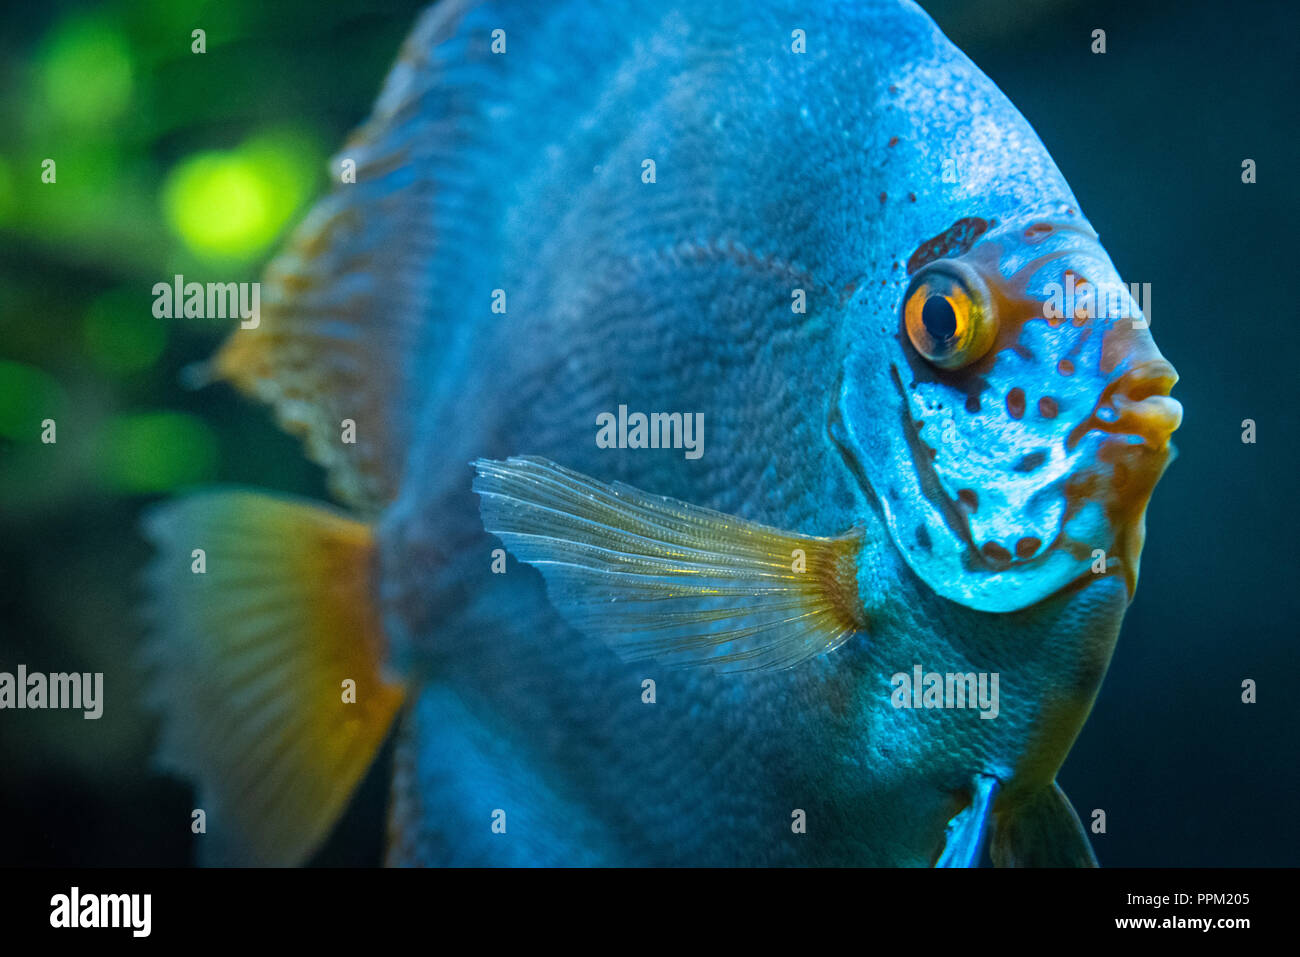 Blue Discus Symphysodon Aequifasciatus A Tropical Fresh Water